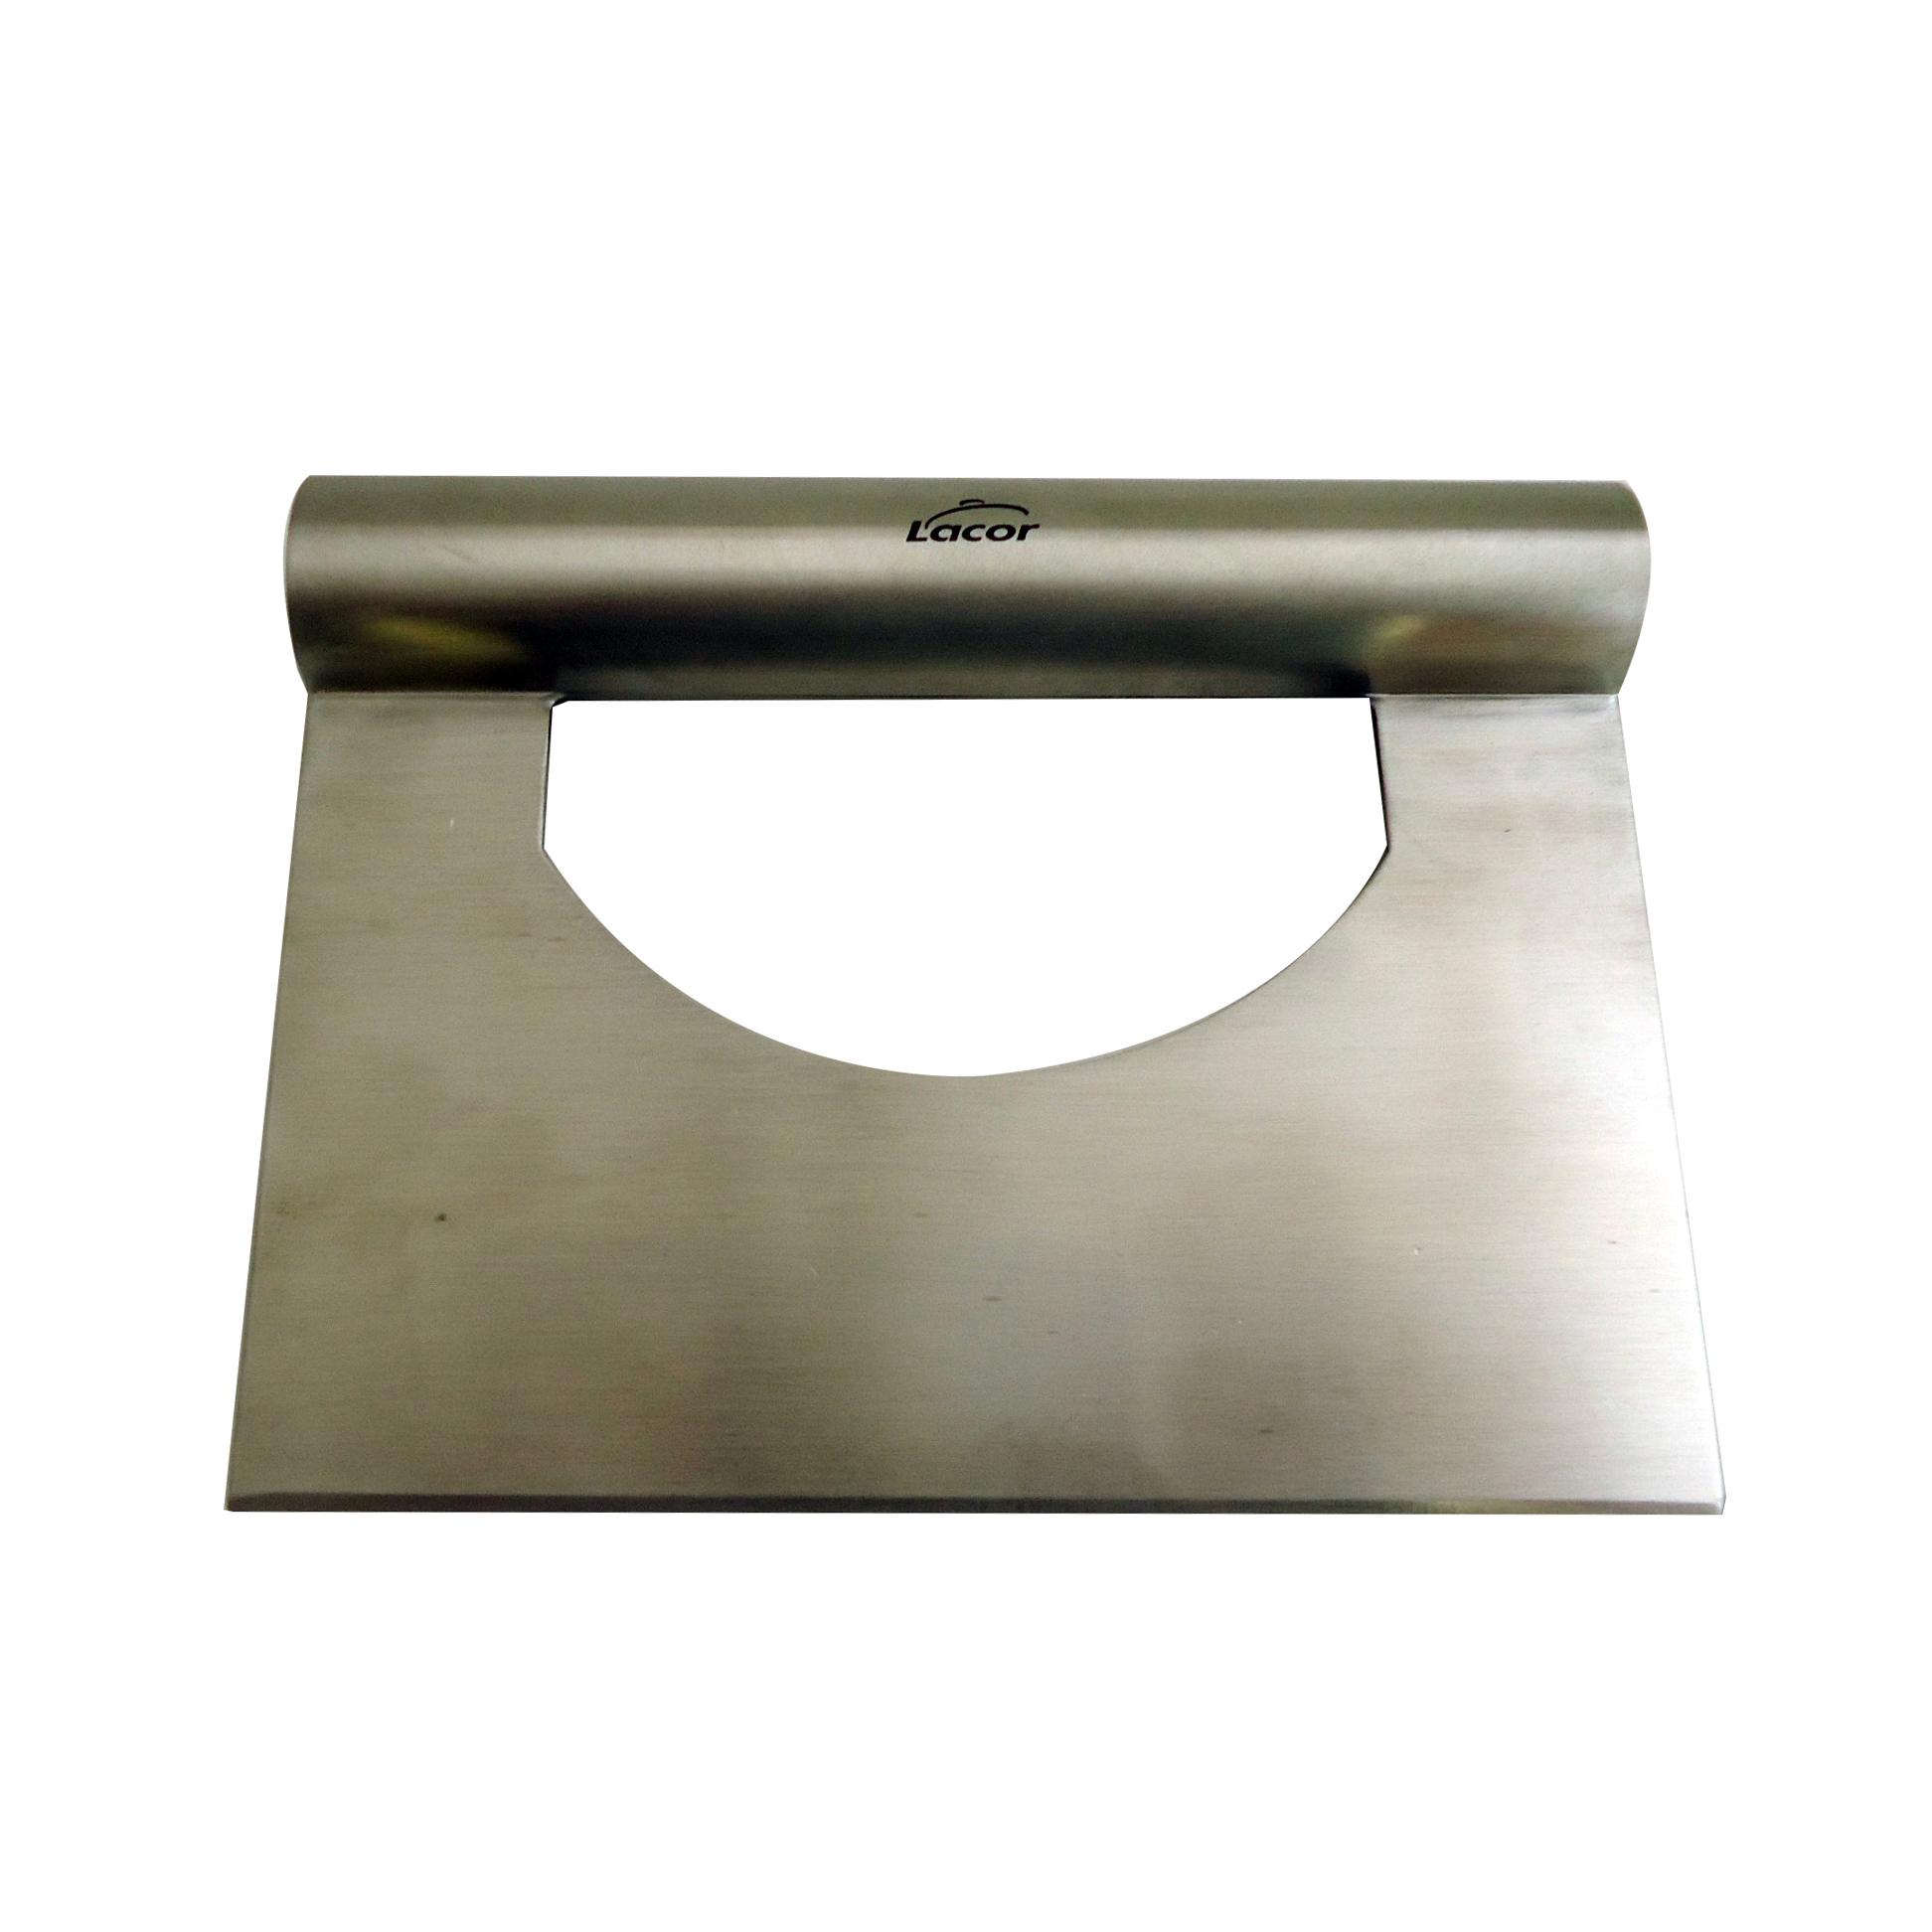 LACOR 67006 Κόπτης Ζύμης Ανοξείδωτος - 150x90mm επαγγελματικός εξοπλισμός   επαγγελματικά σκεύη είδη σερβιρίσματος   εργαλεία κο